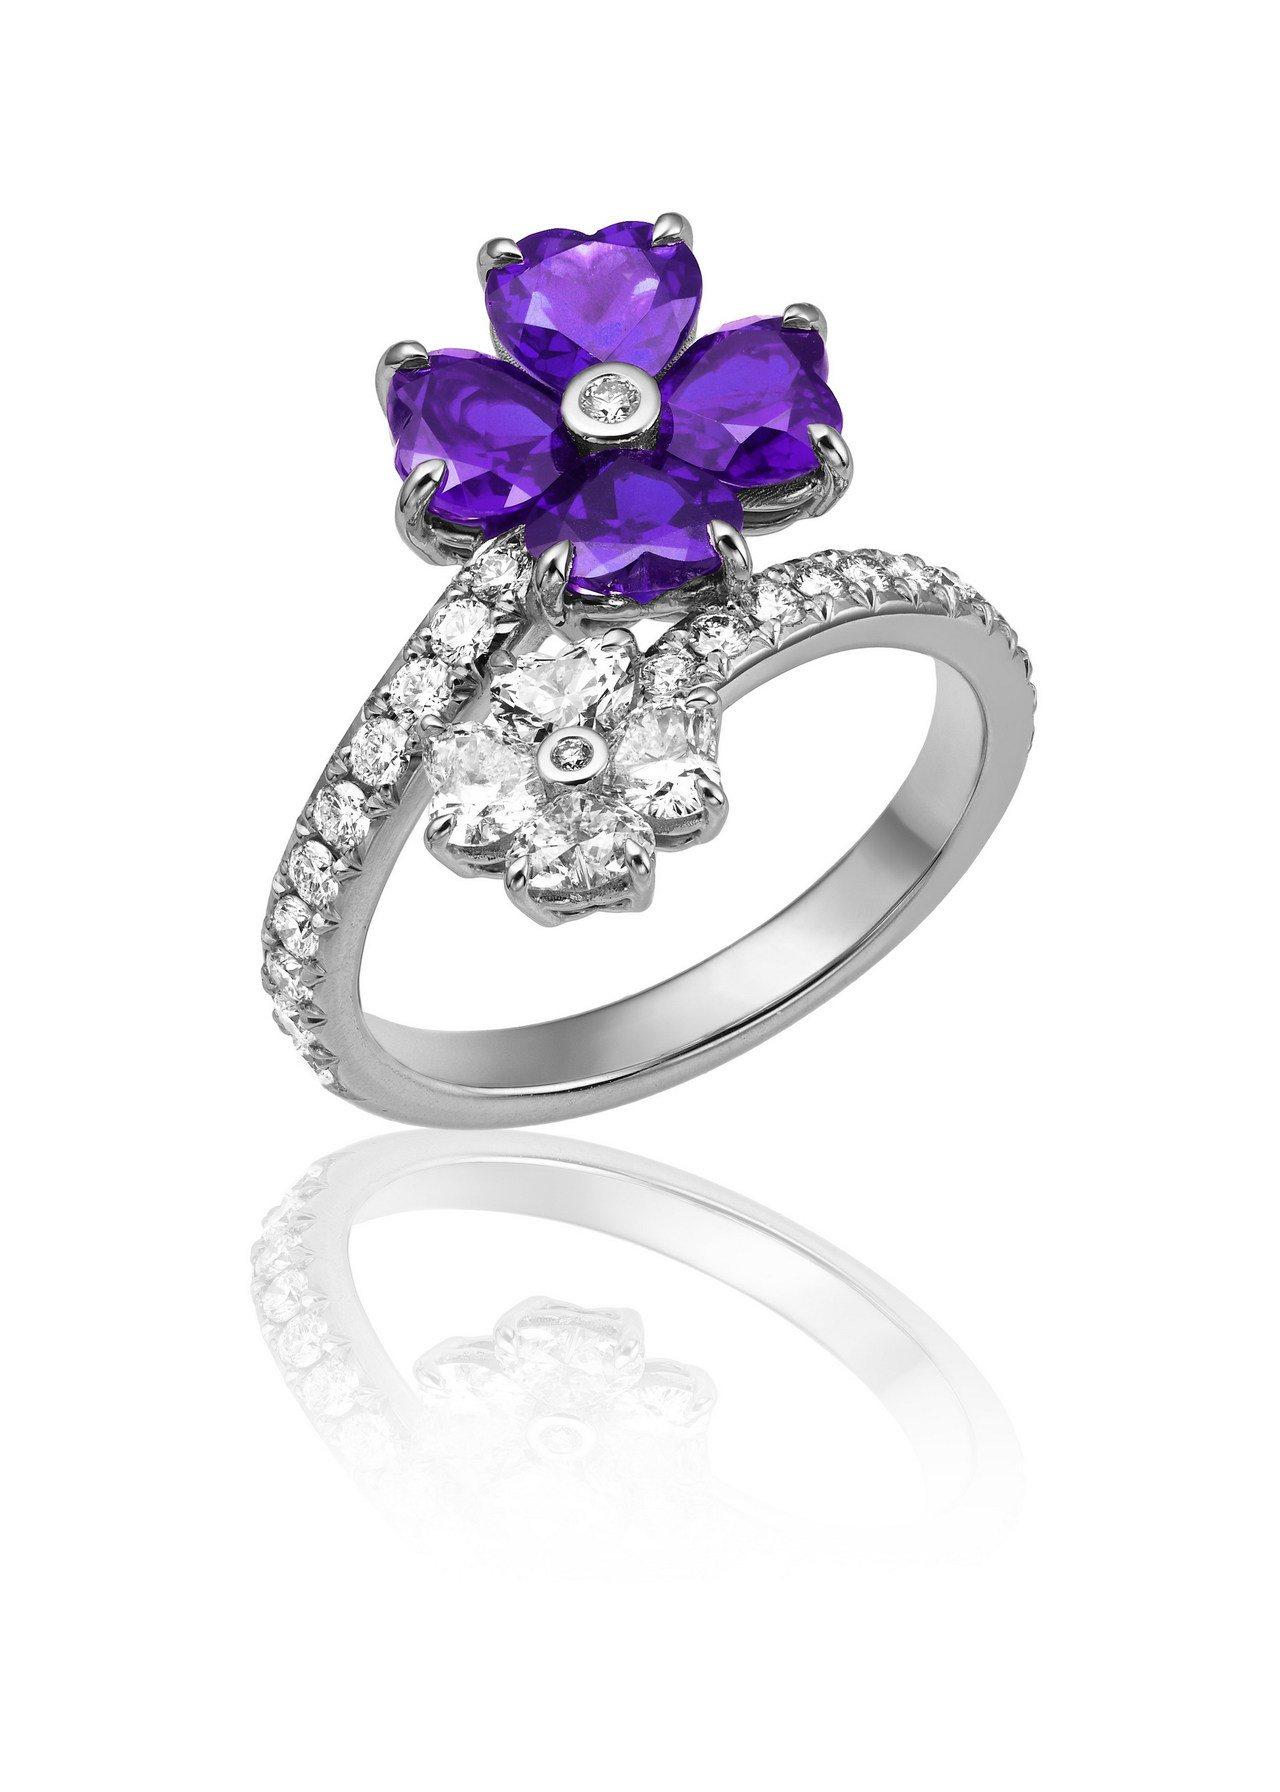 Precious Chopard系列戒指,18K白金鑲嵌鑽石與4顆紫水晶,32萬...